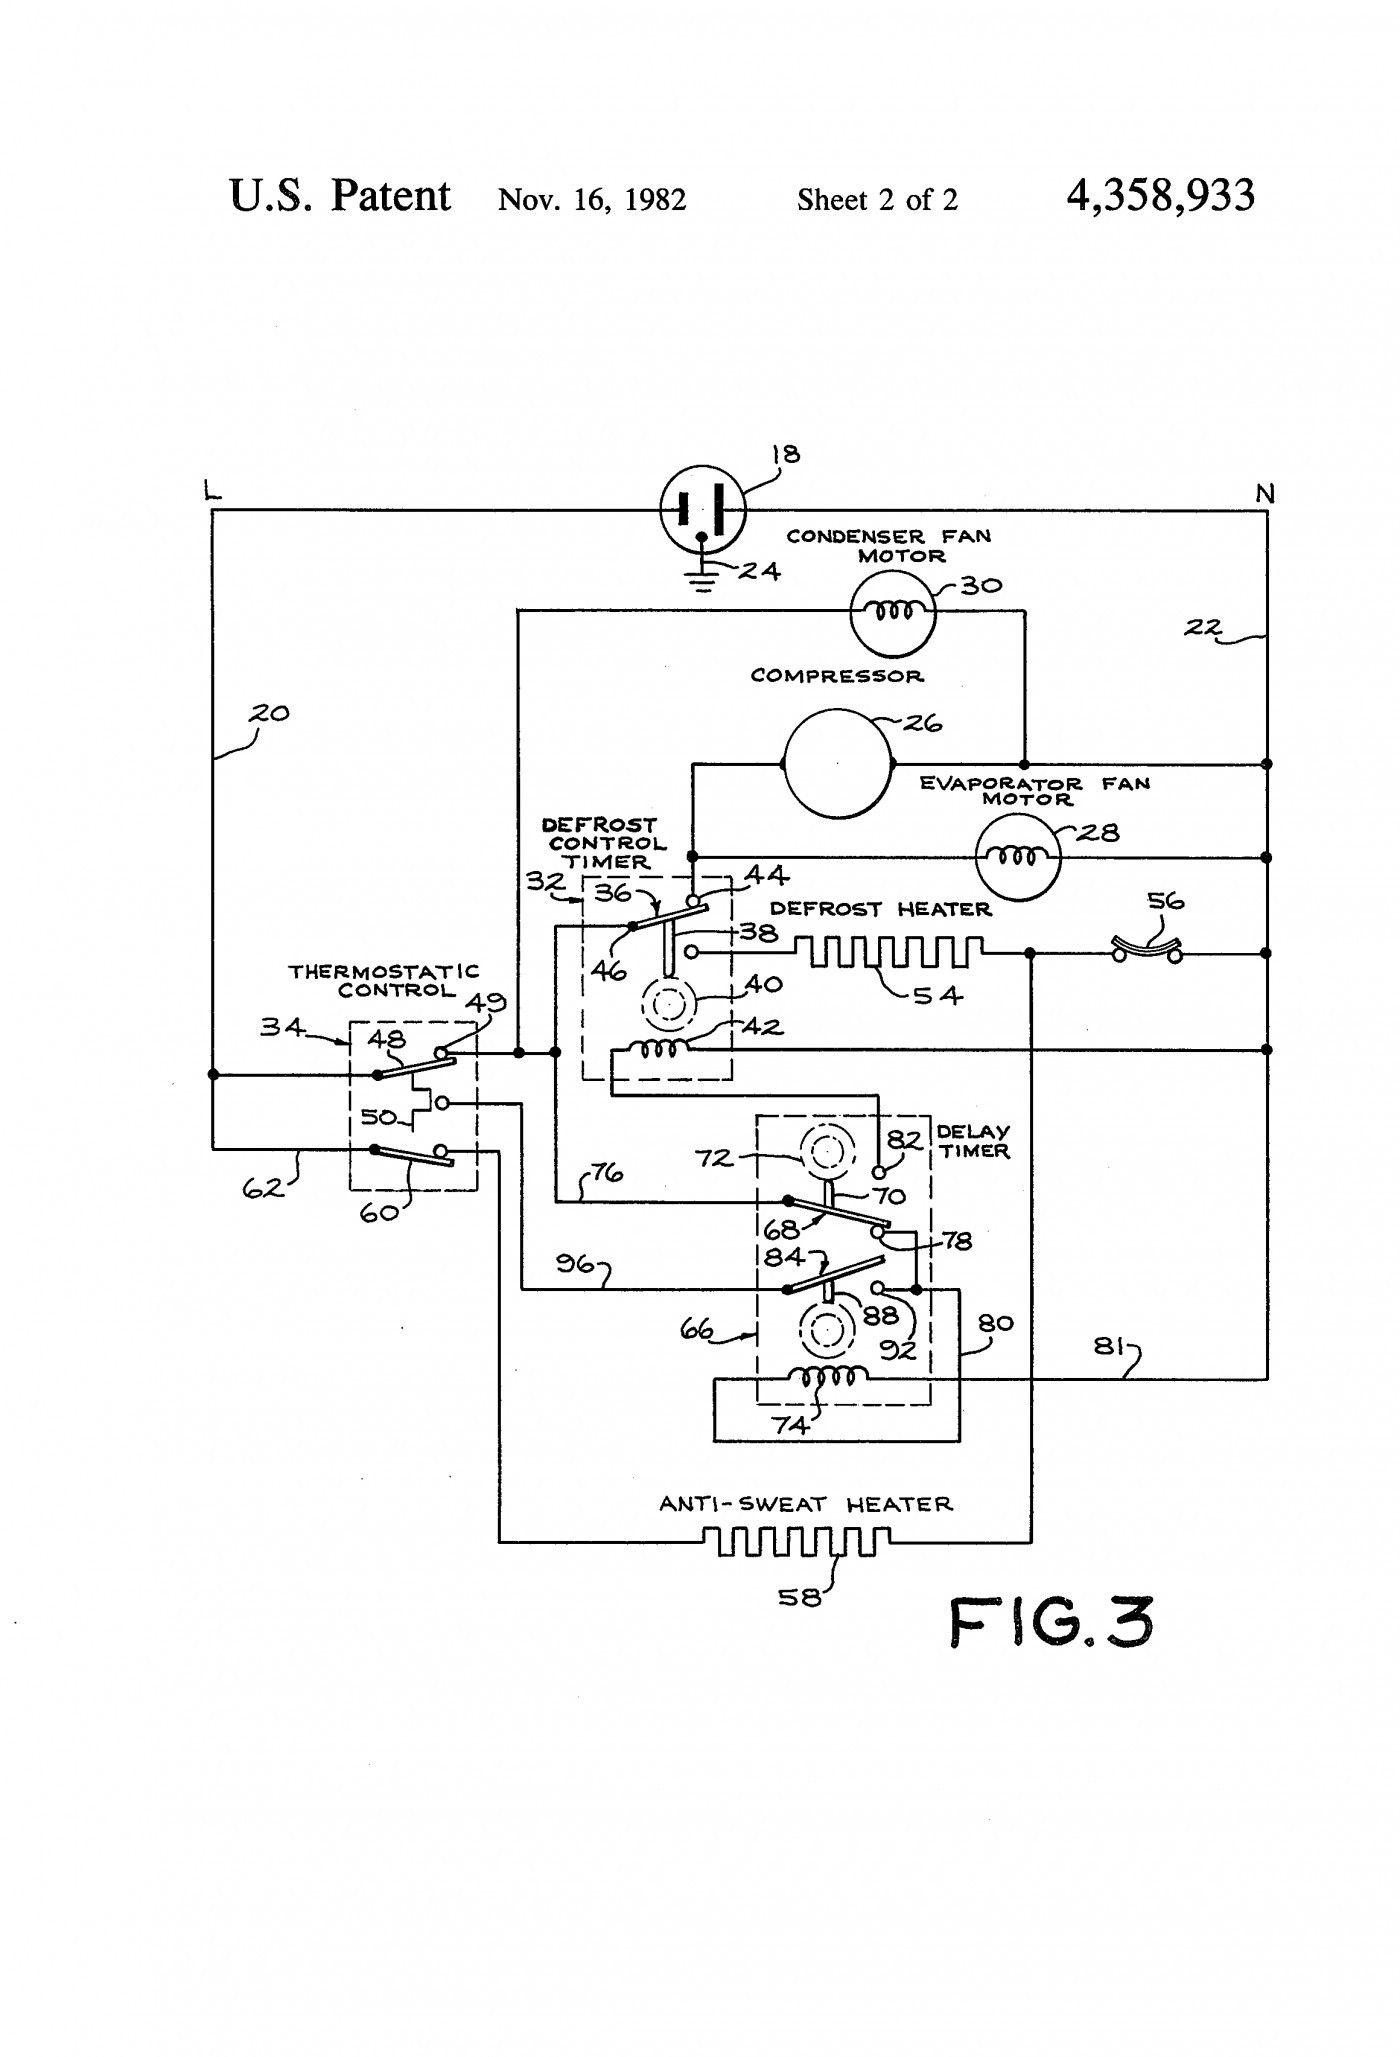 heatcraft service mate wiring diagram